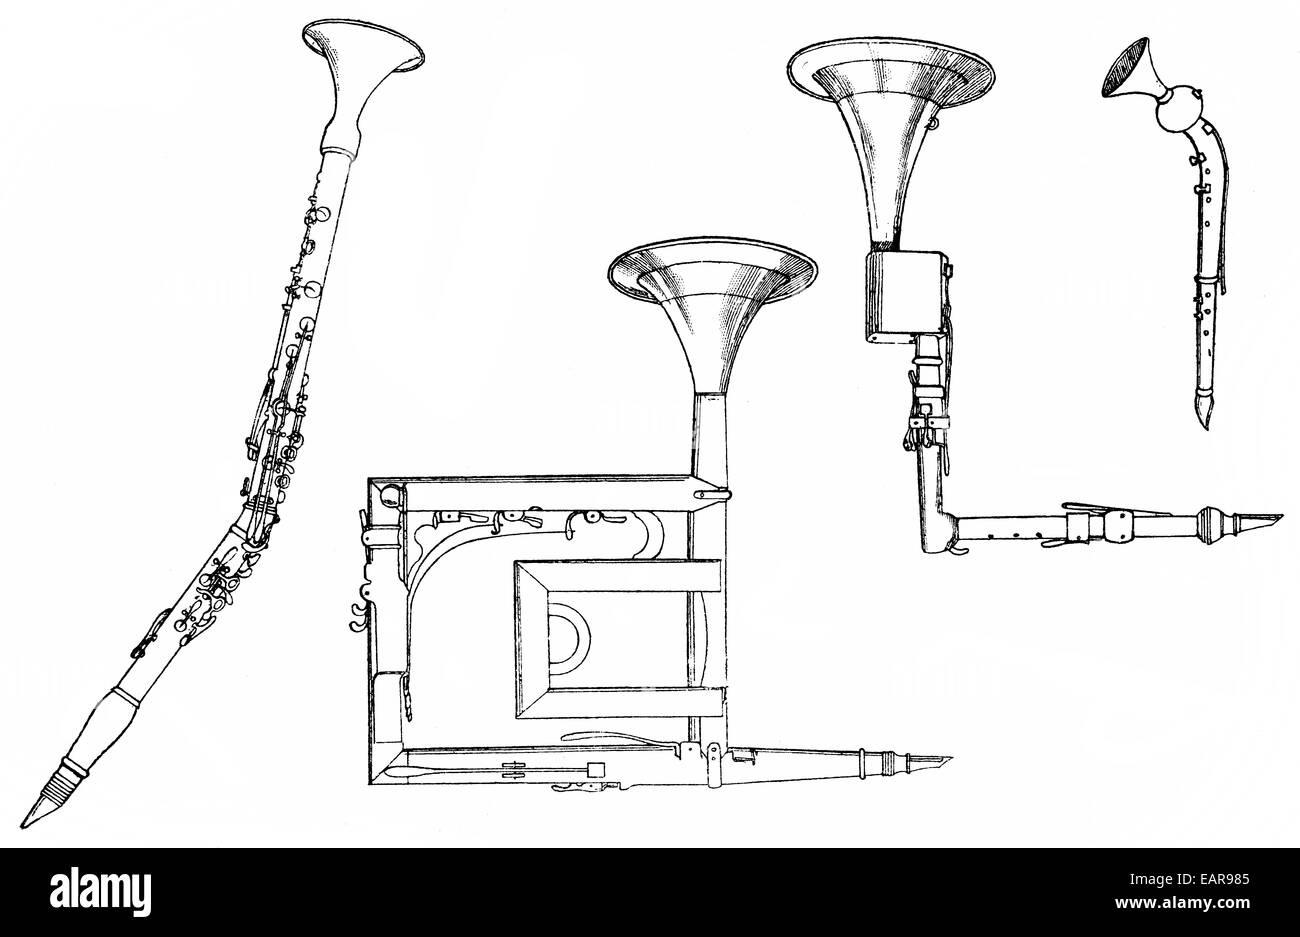 hight resolution of woodwind instruments basset horn or corno bassetto basset clarinet holzblasinstrumente bassetthorn oder